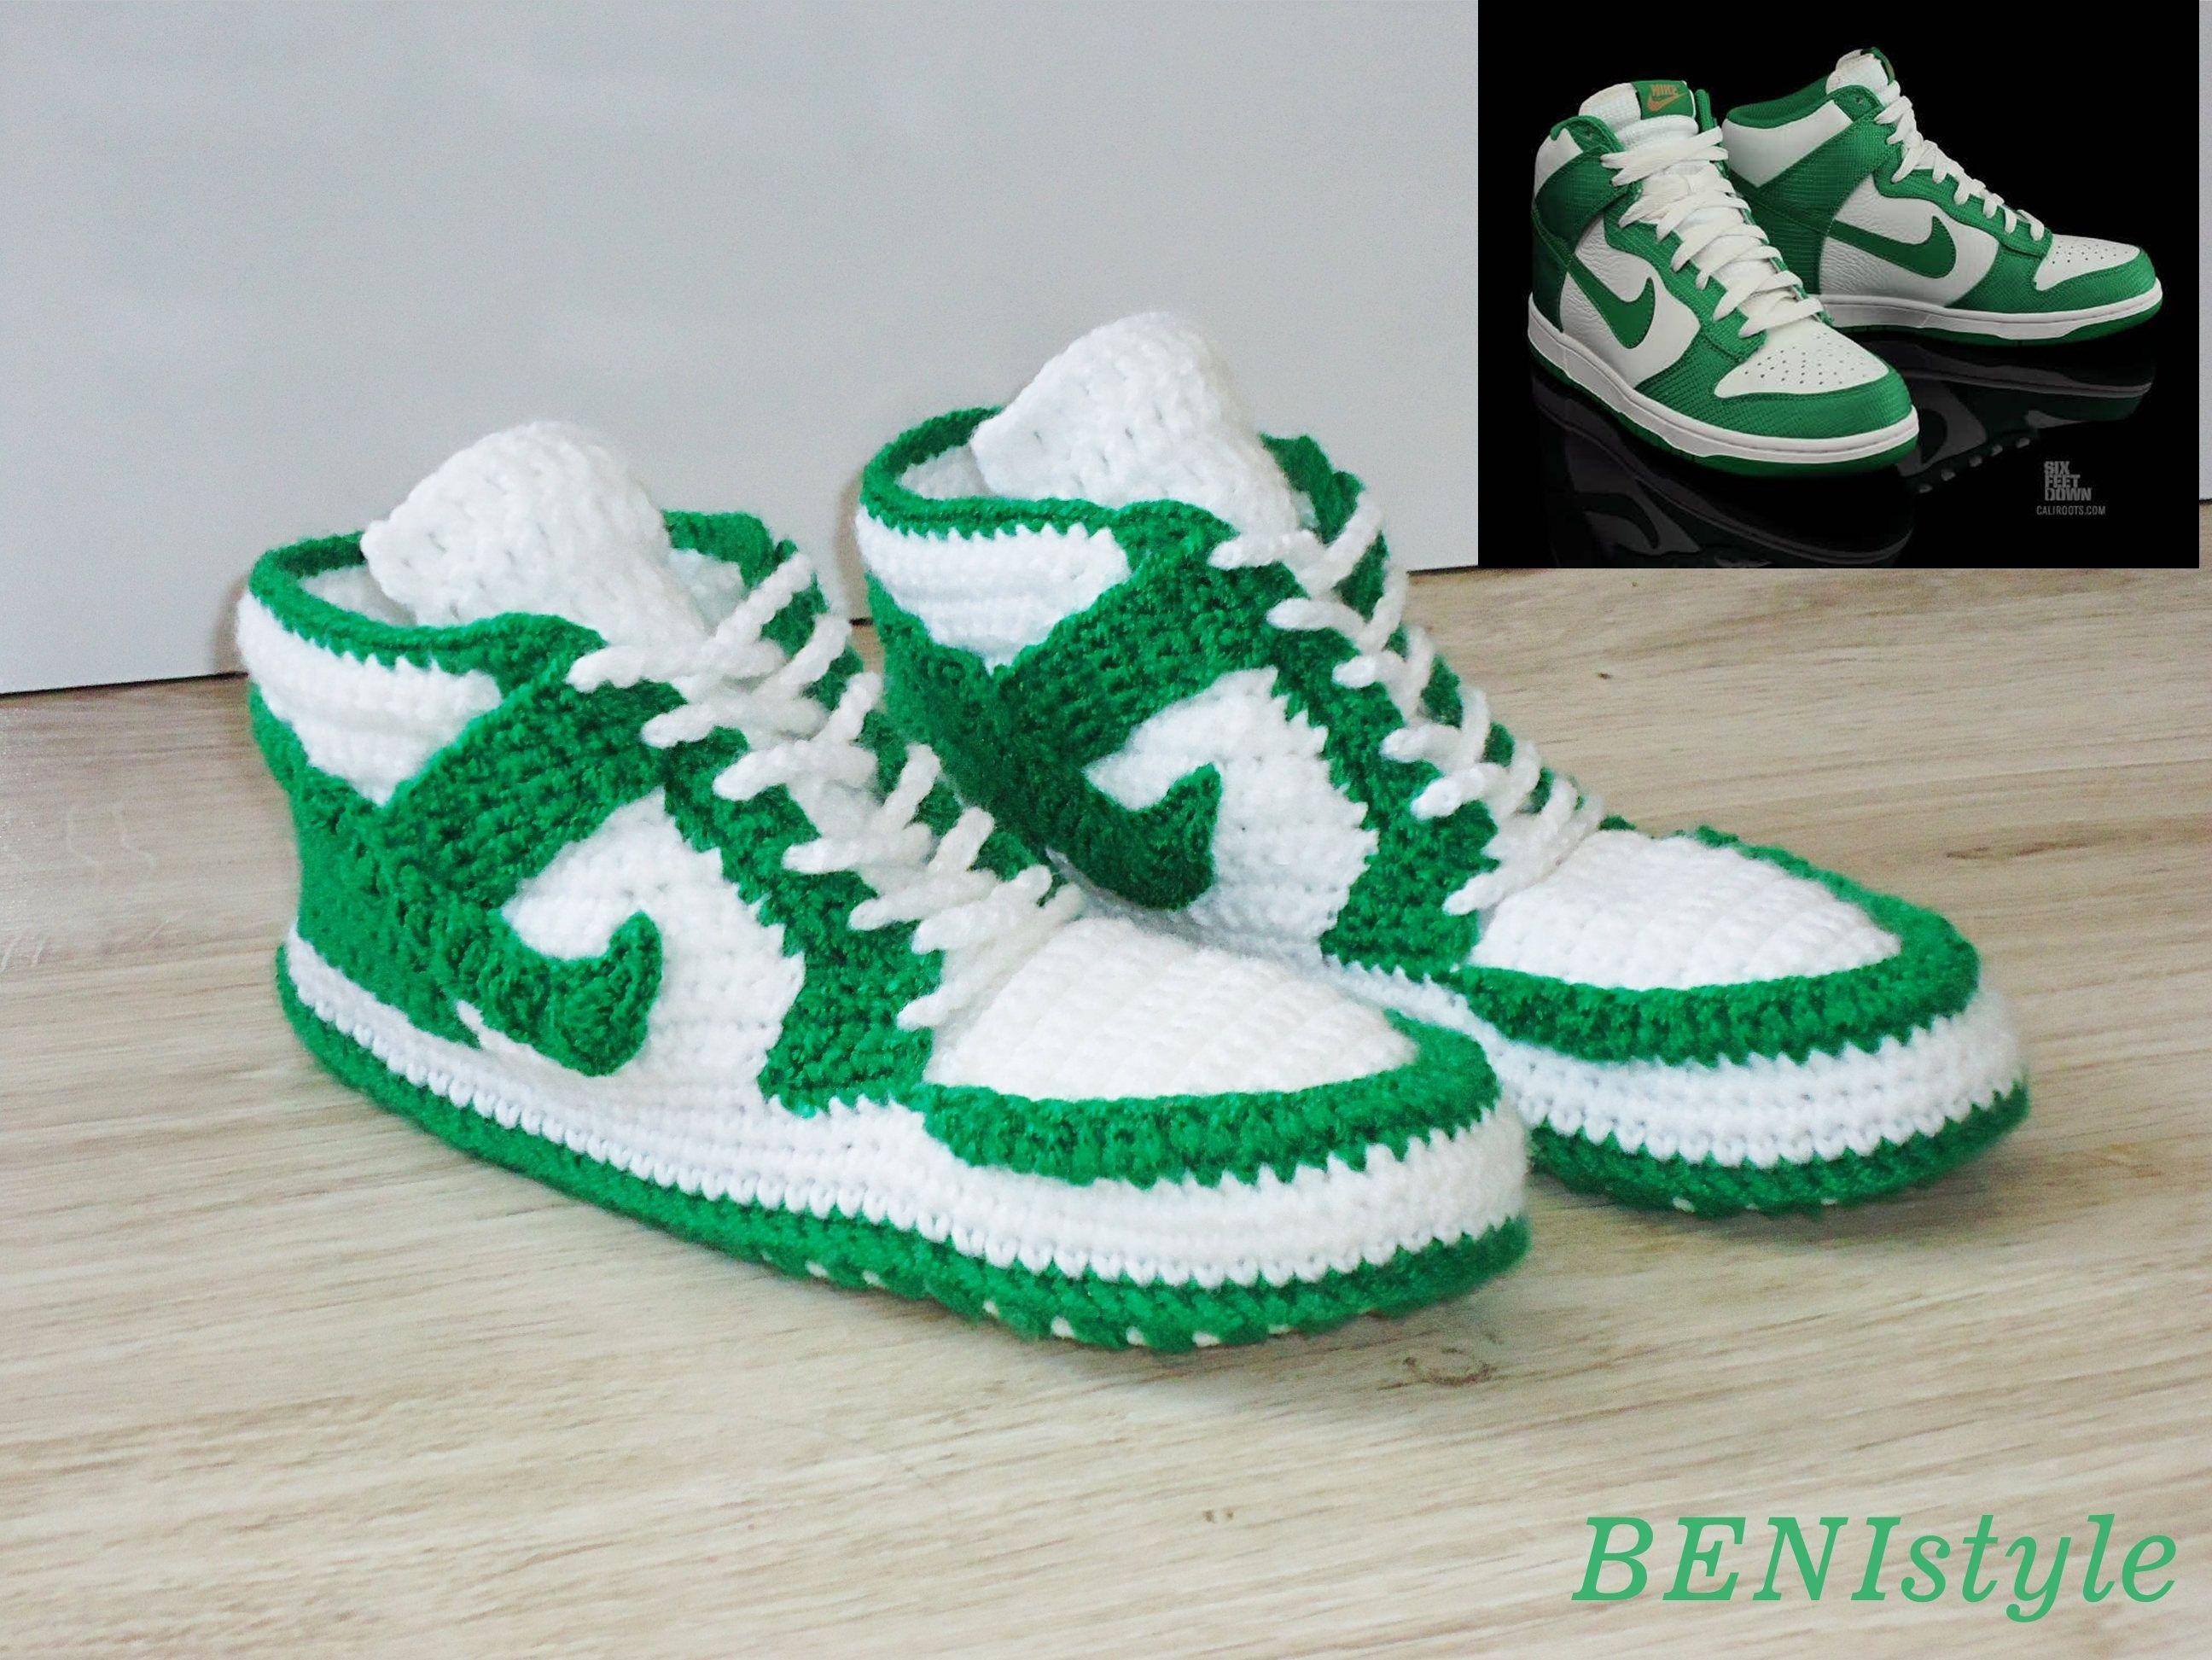 jordan adult shoes